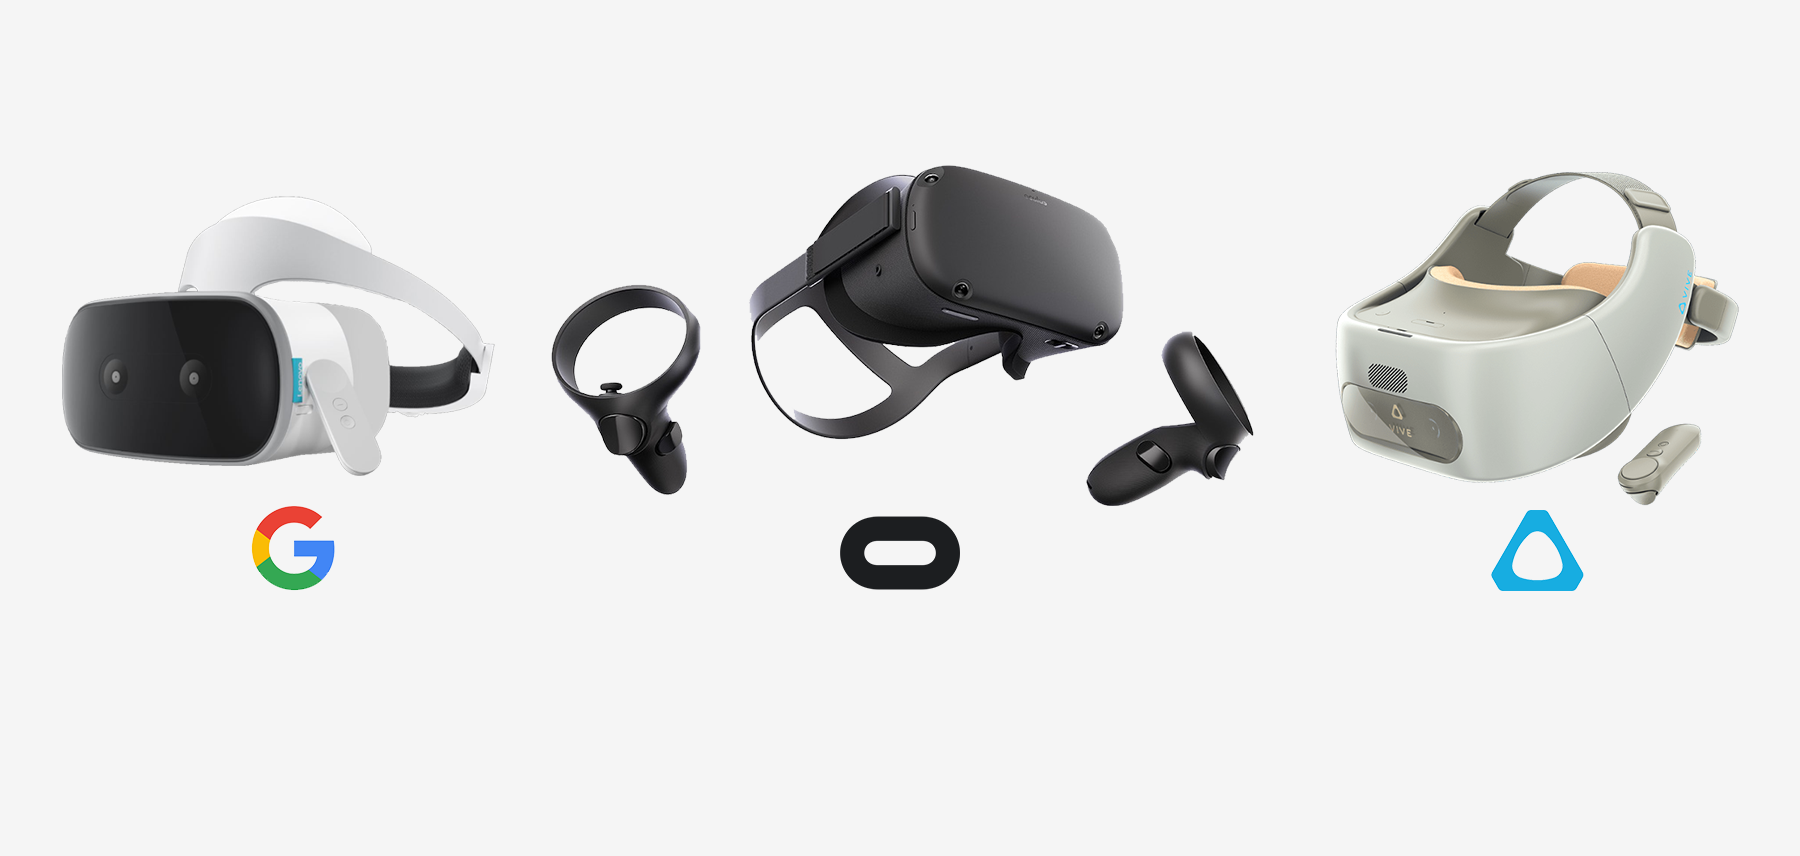 Oculus Quest vs Vive Focus vs Lenovo Mirage Solo 6DoF